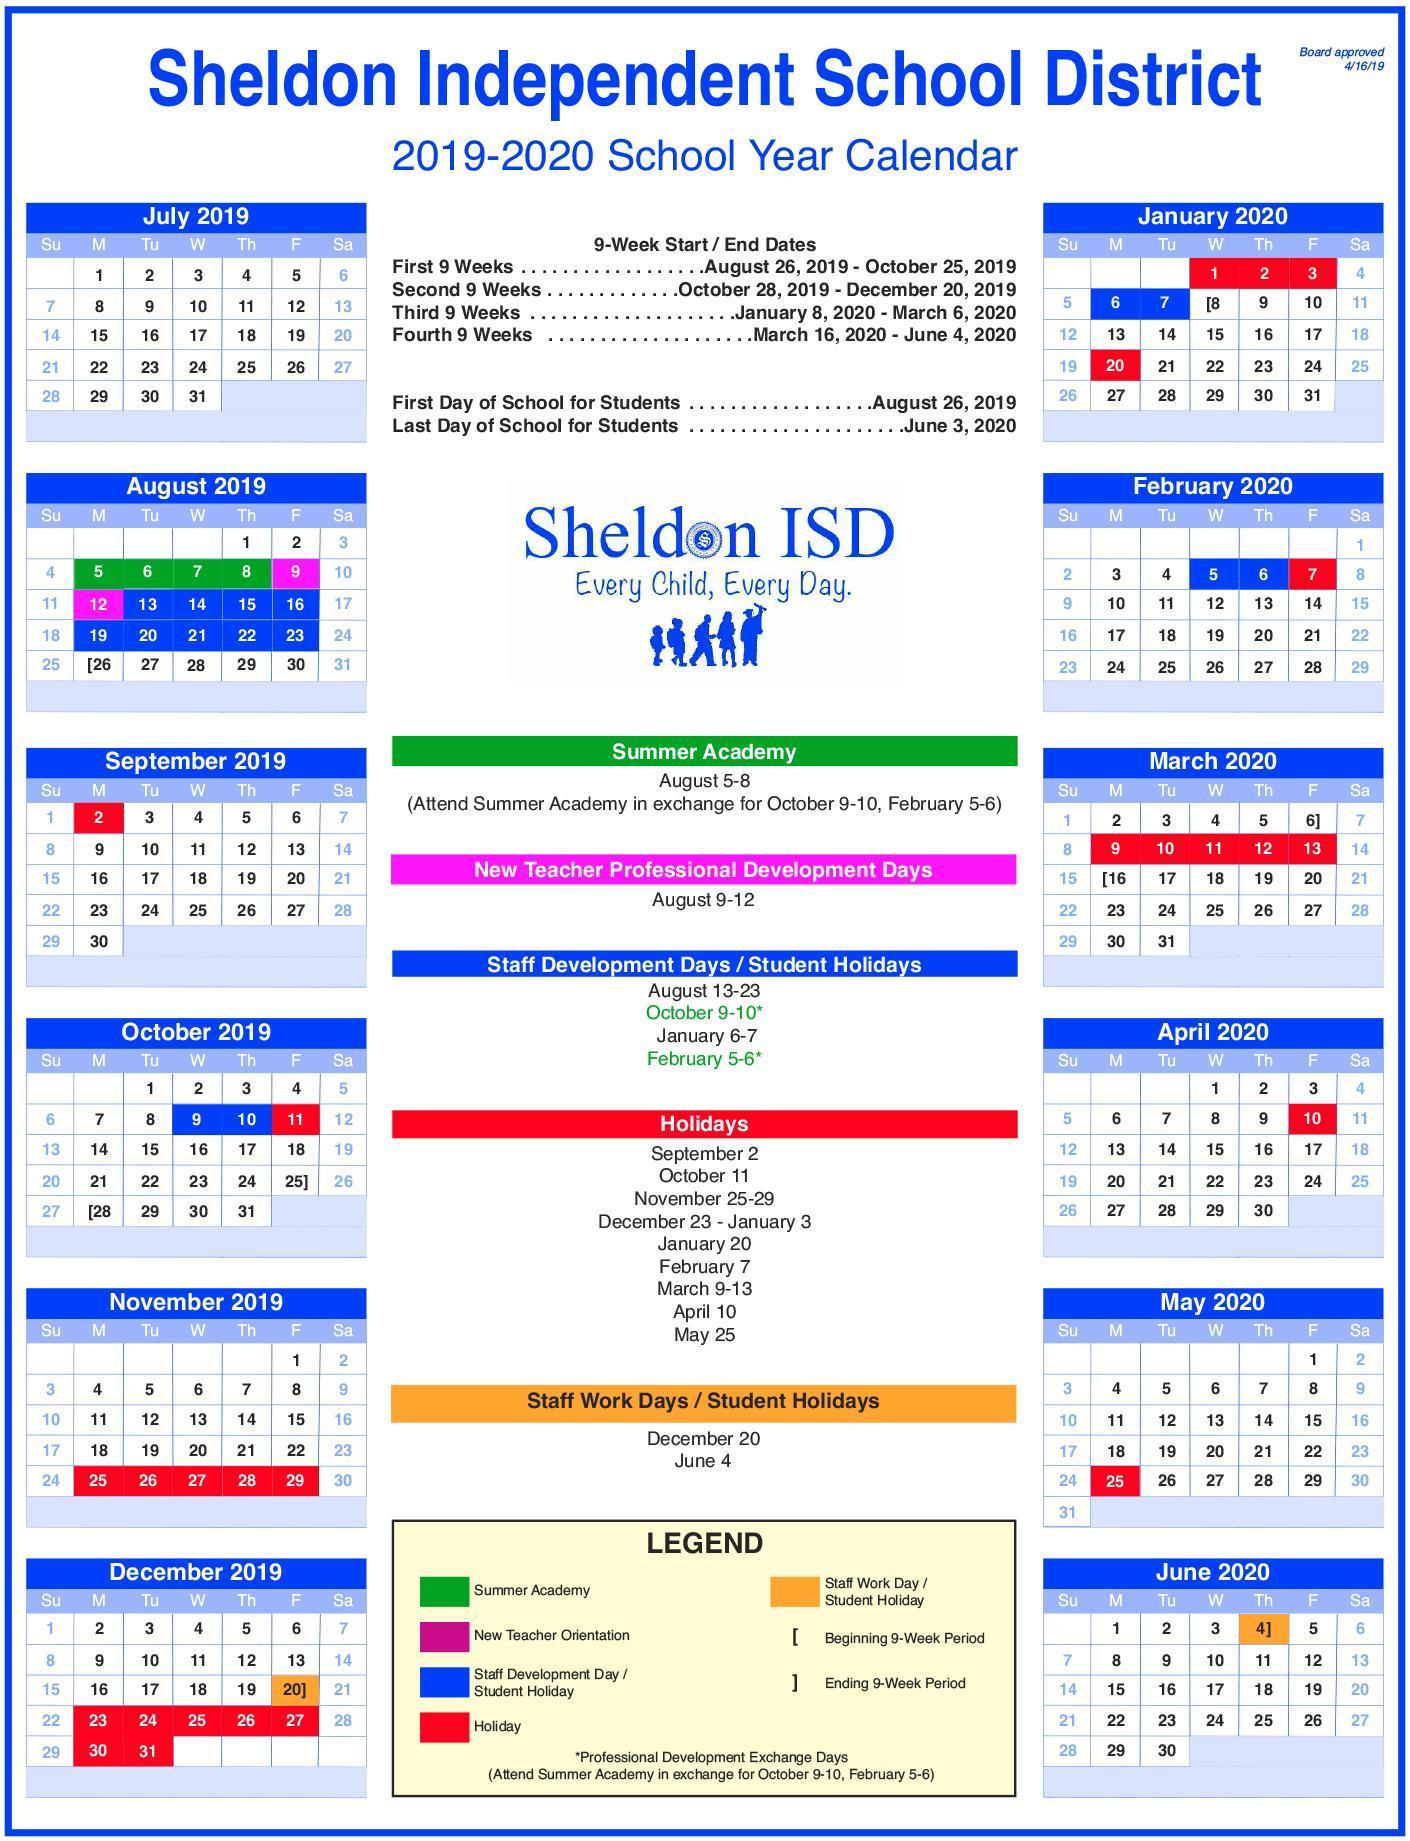 Sheldon Isd throughout U Of M School Year 2019-2020